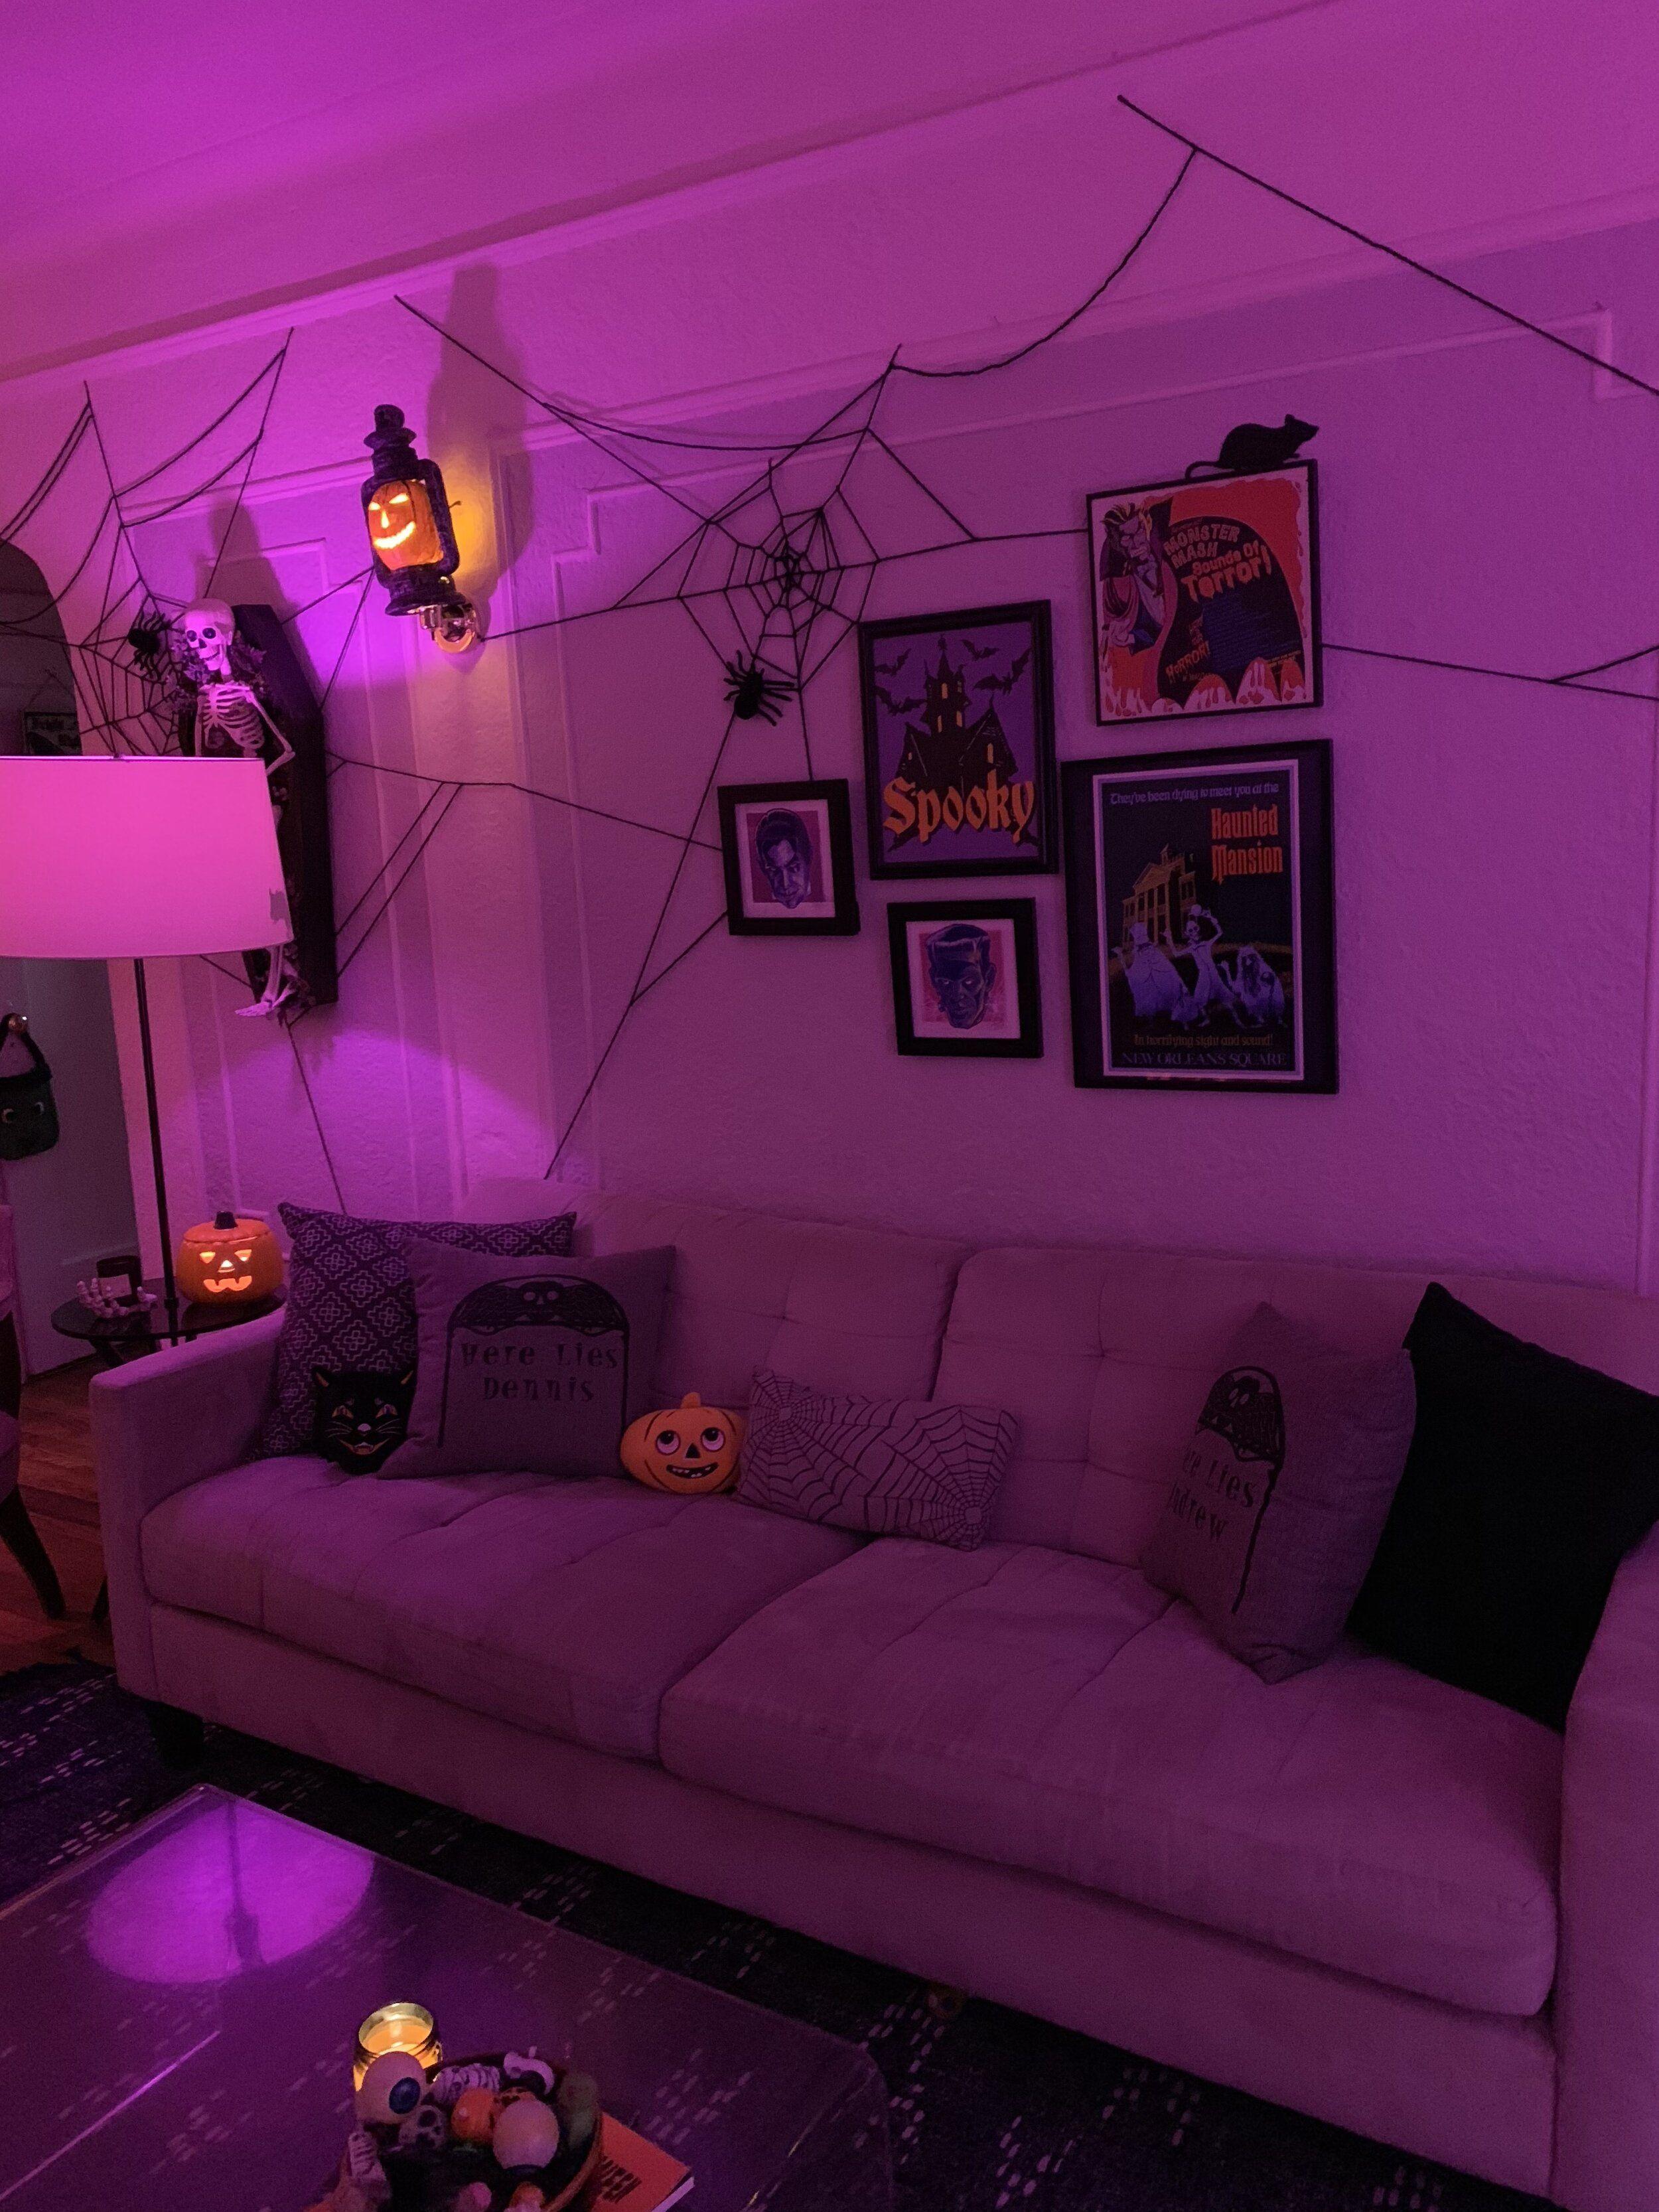 Vampirina Halloween Party 2020 Ny Halloween Apartment Tour 2019 — Crafty Lumberjacks in 2020 | Diy